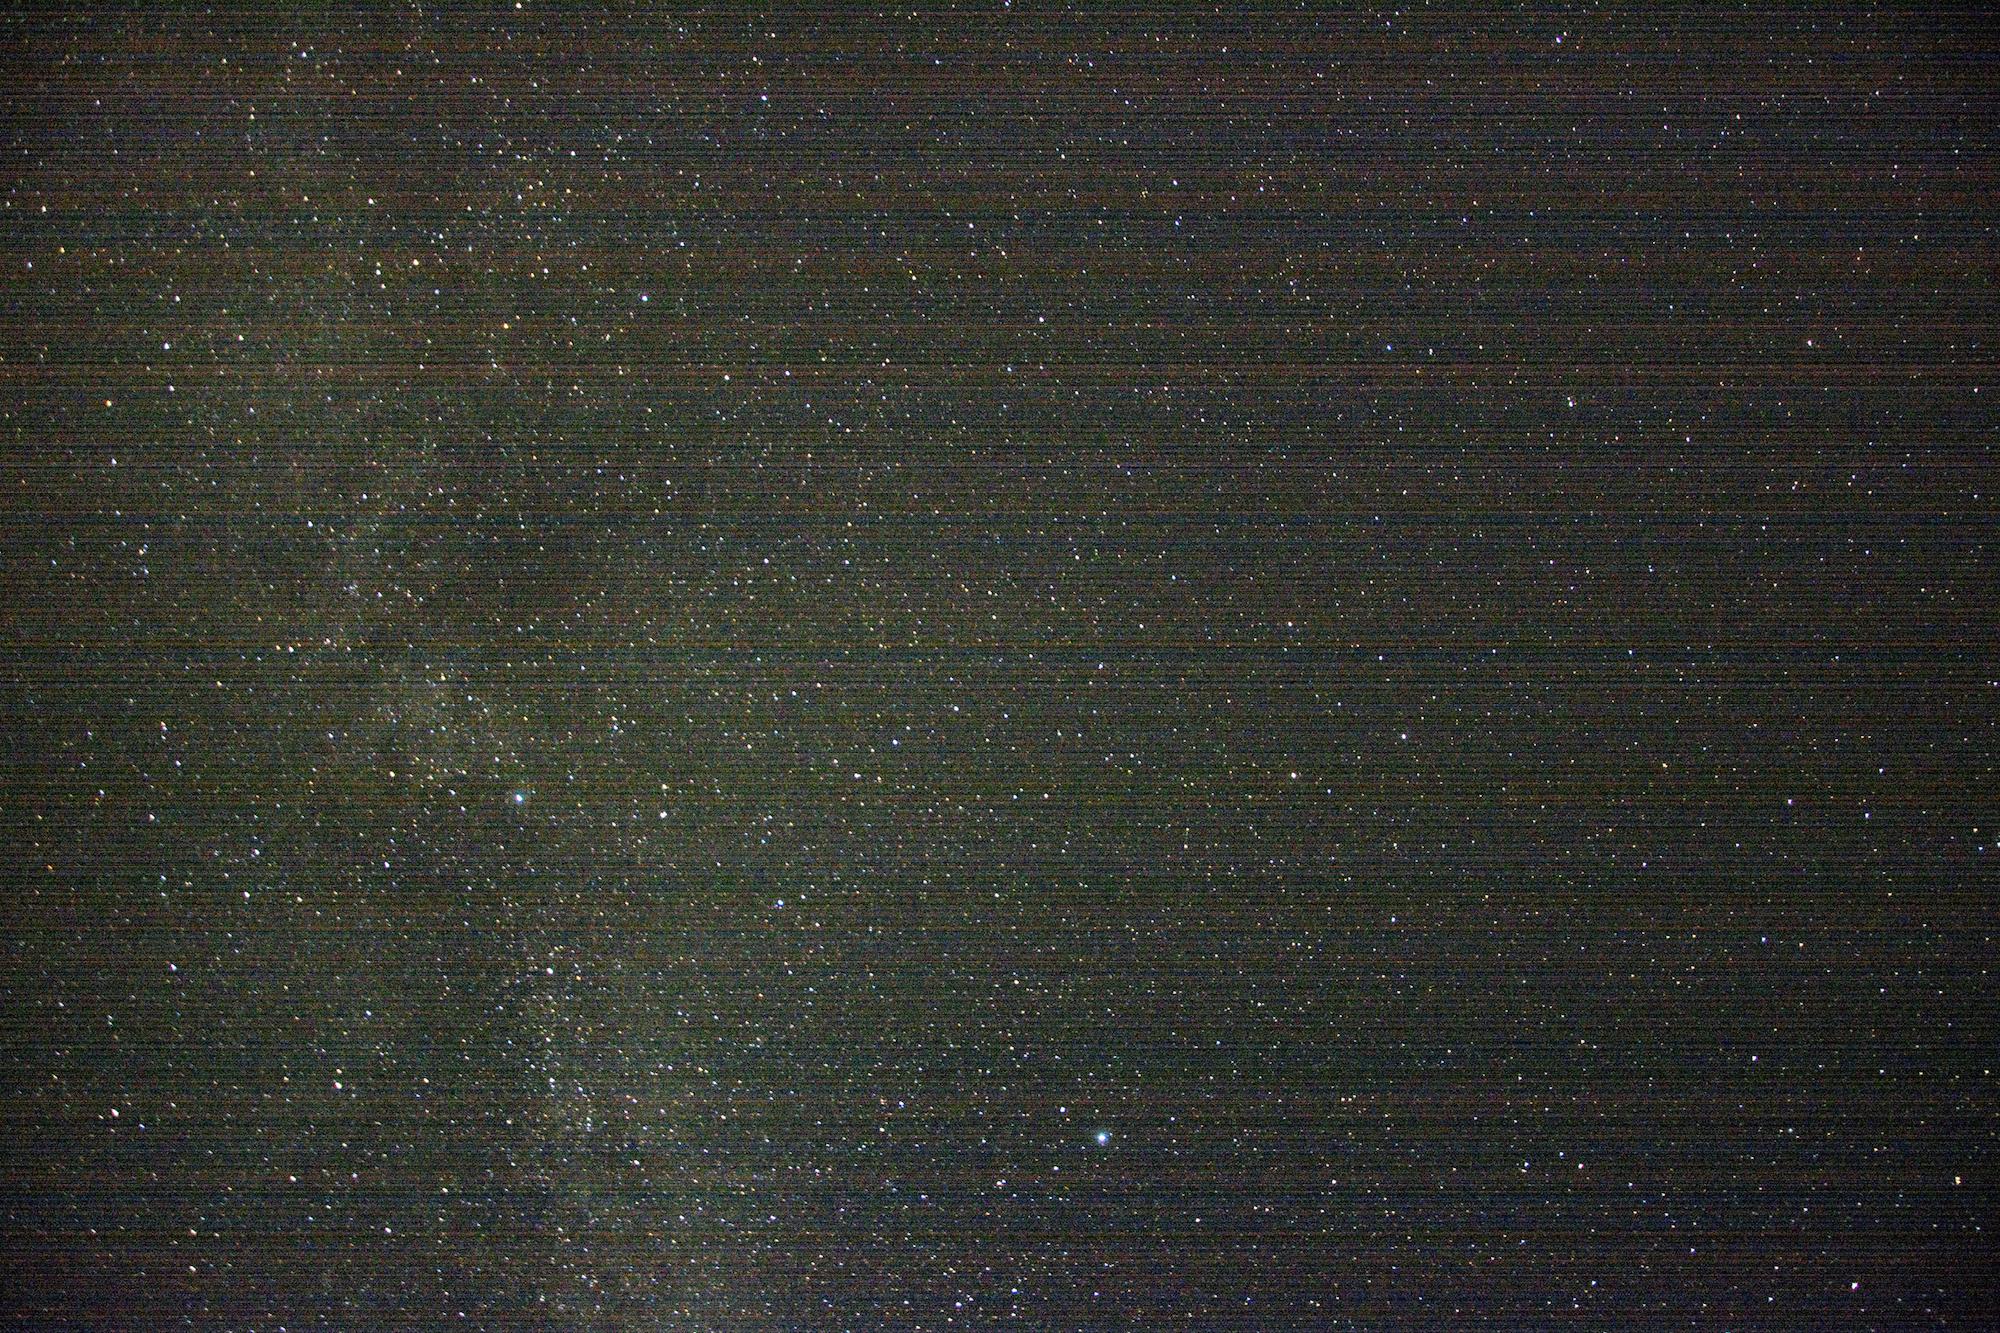 Michael John Whelan  Stars above Mount Leinster 2014 C-print (alubond mount), framed 41.5 x 60 cm Edition of 3 + 2AP